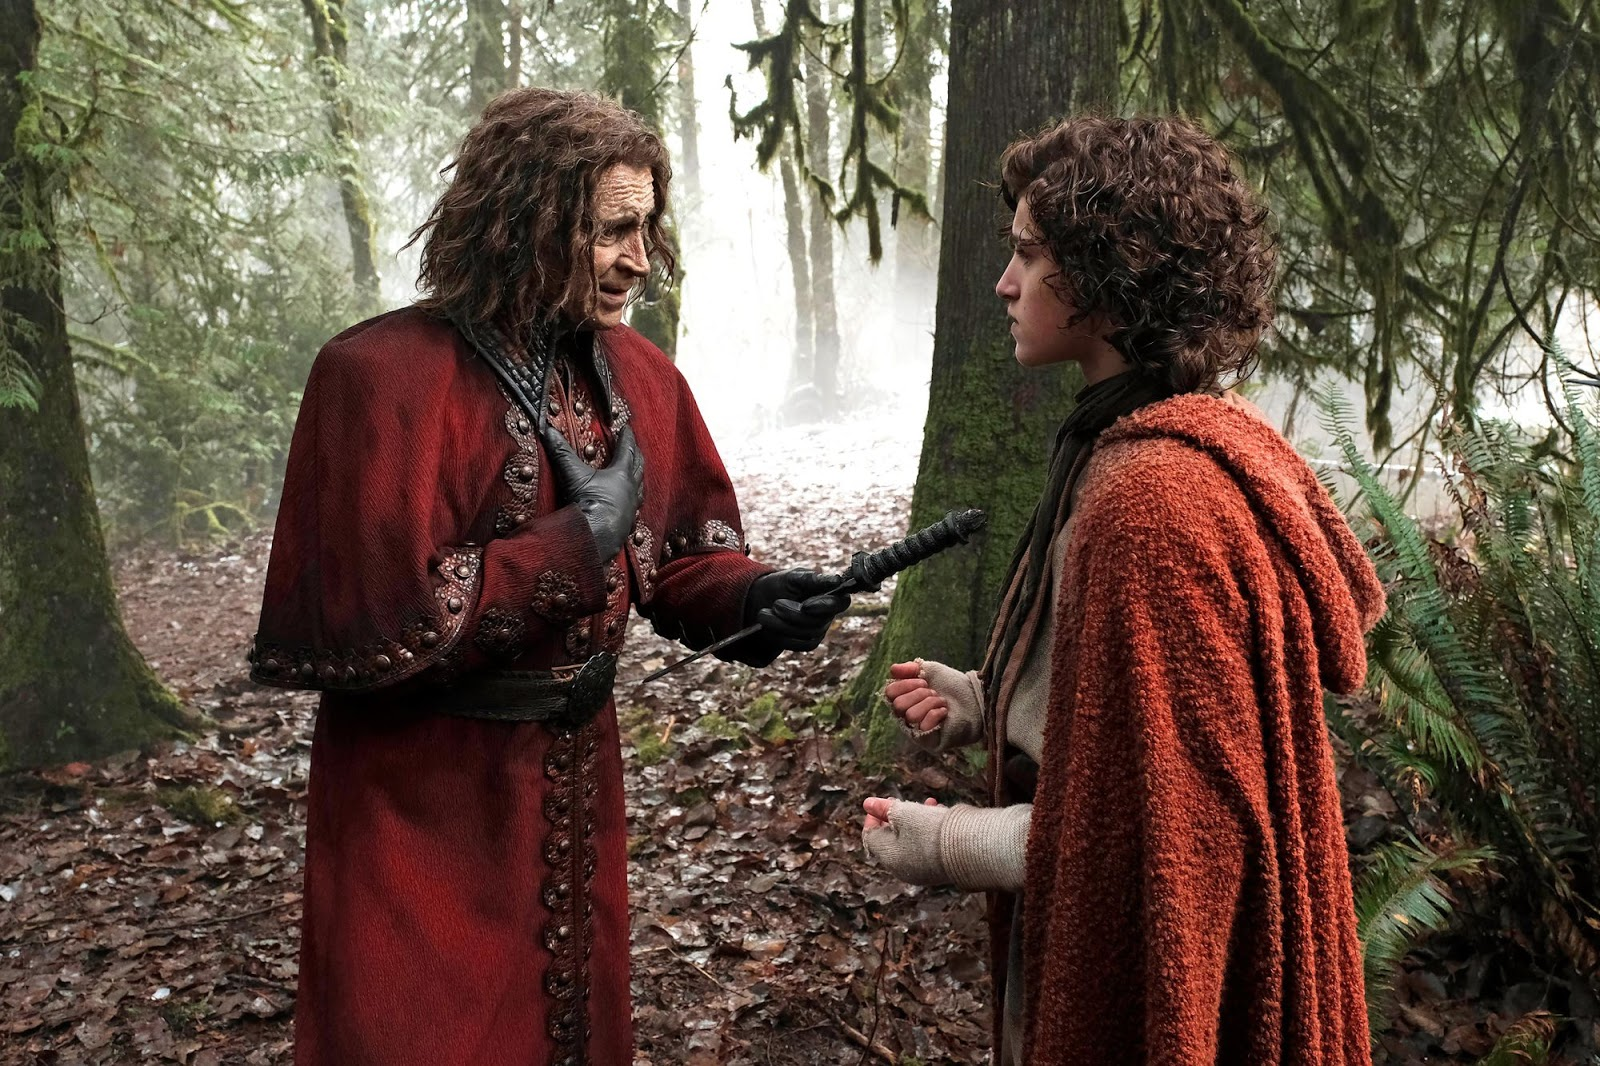 Rumplesltiltskin dándole su daga a Bae en 'Once Upon a Time'